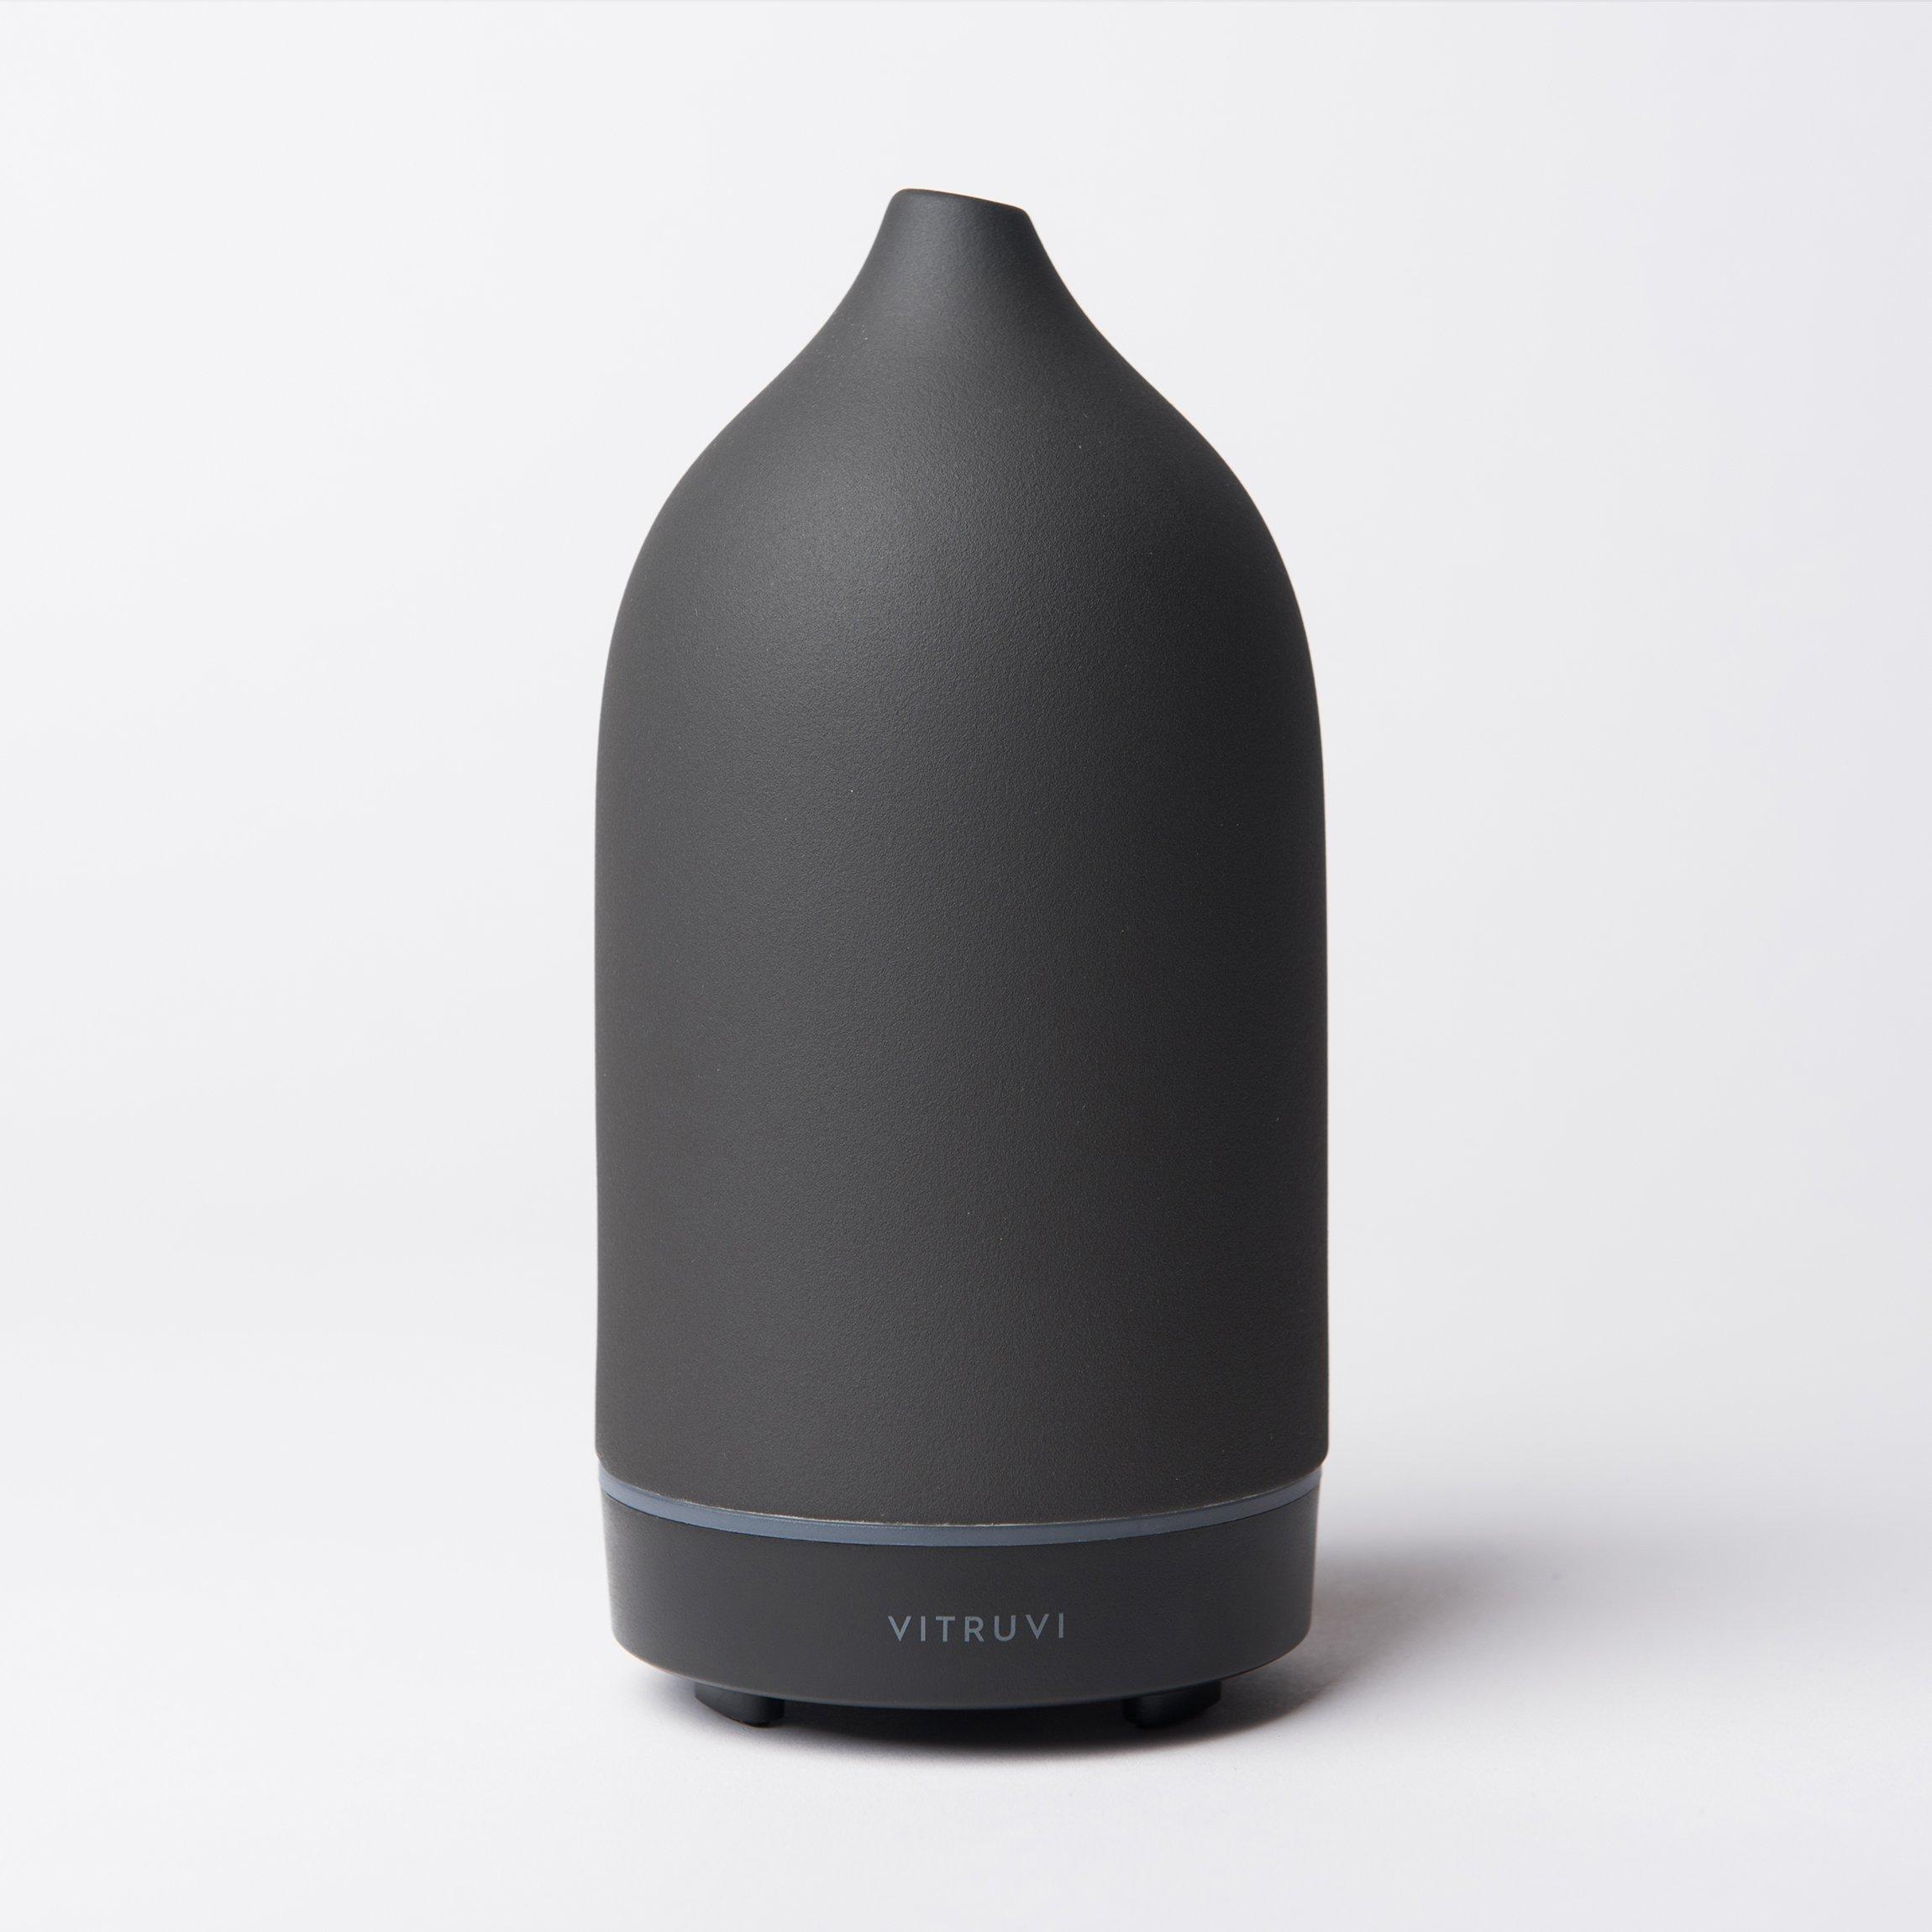 Vitruvi Stone Diffuser, Hand-Crafted Ultrasonic Essential oil Diffuser for Aromatherapy, Ceramic, Black, 100ml Capacity